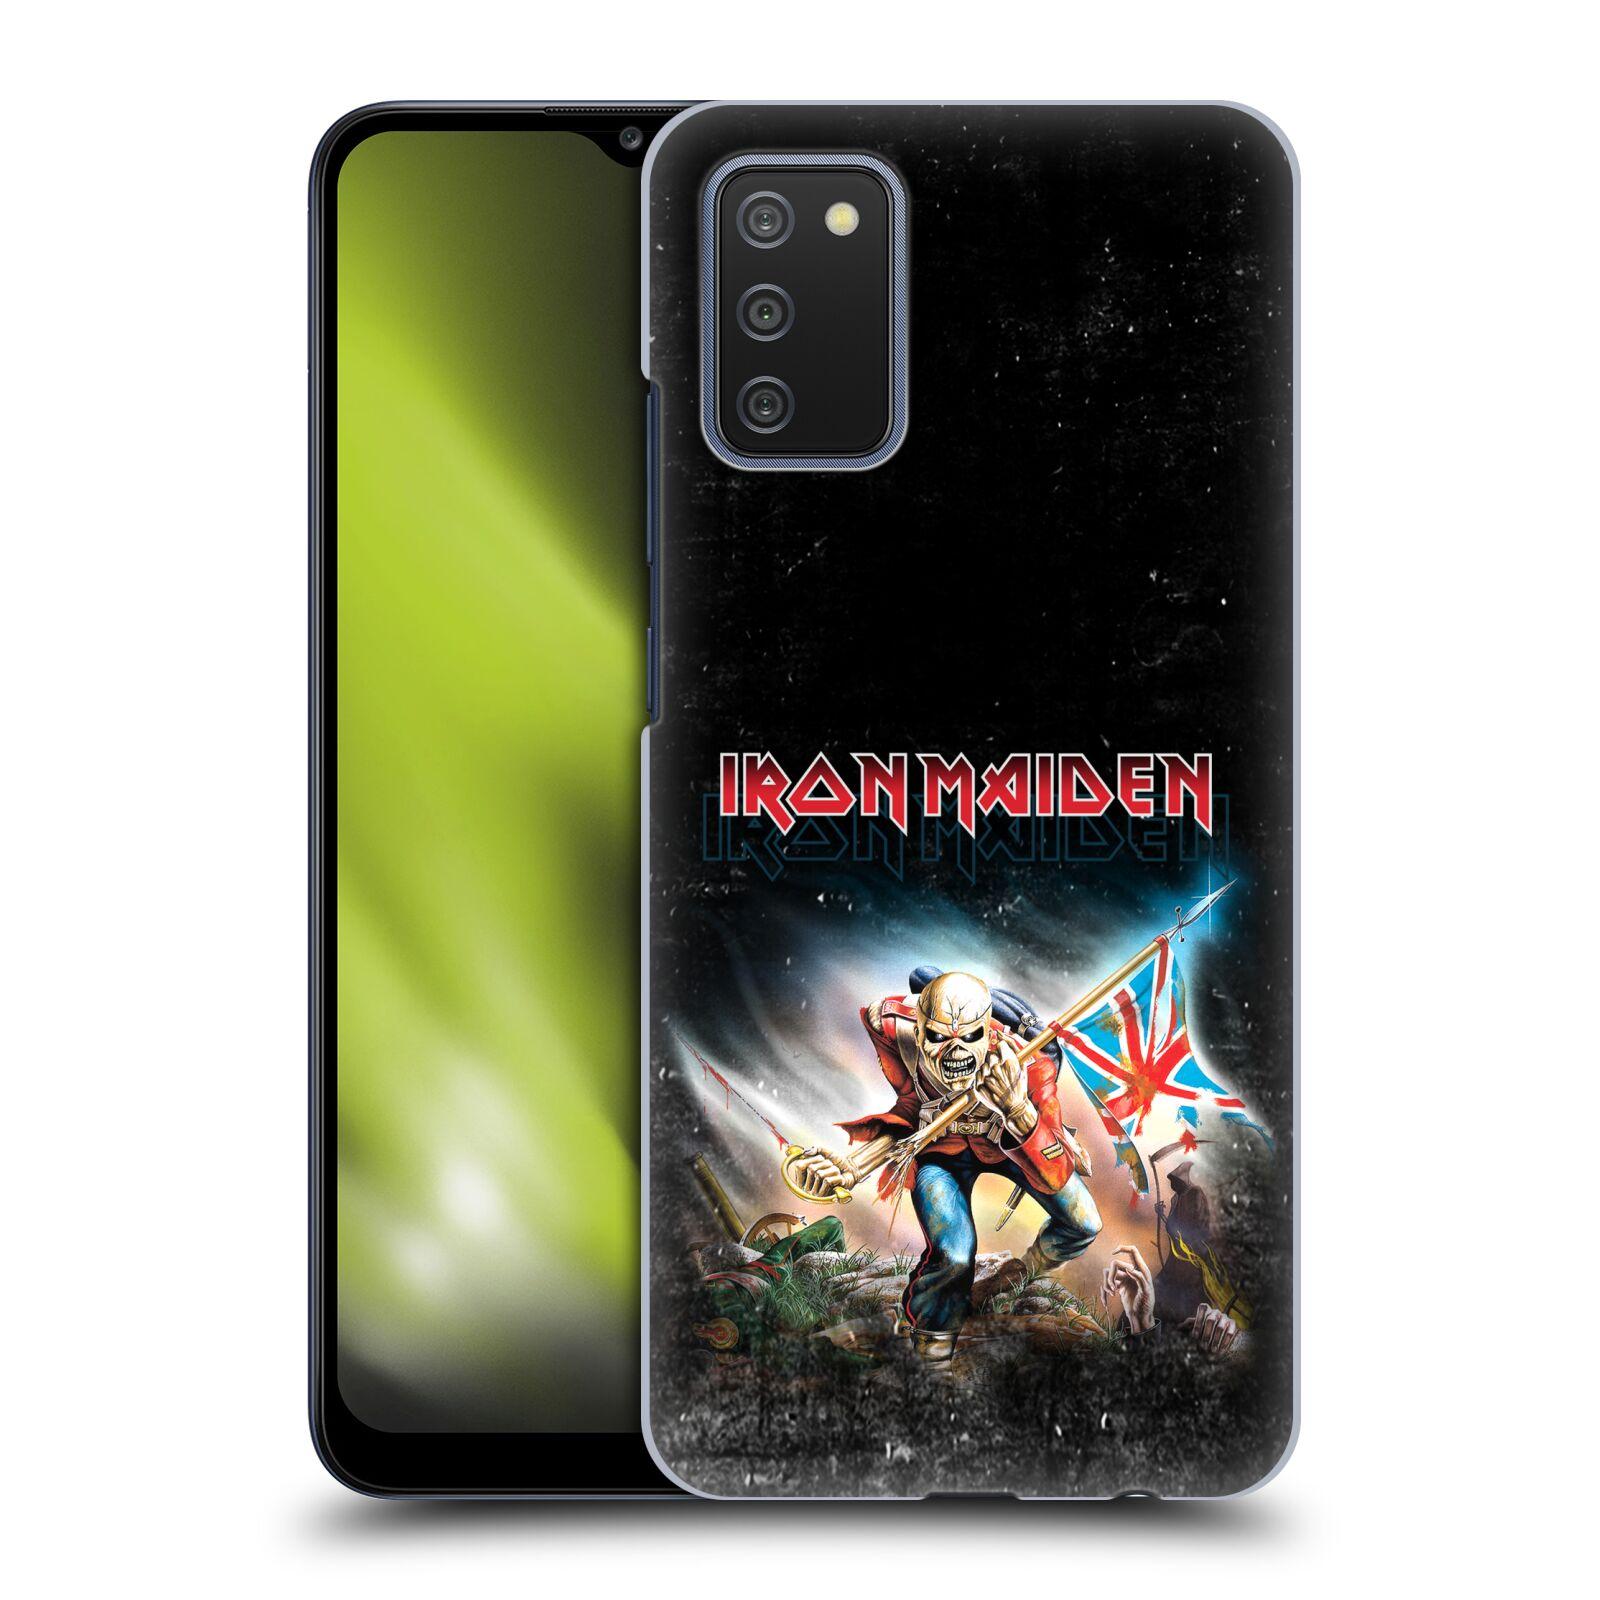 Plastové pouzdro na mobil Samsung Galaxy A02s - Head Case - Iron Maiden - Trooper 2016